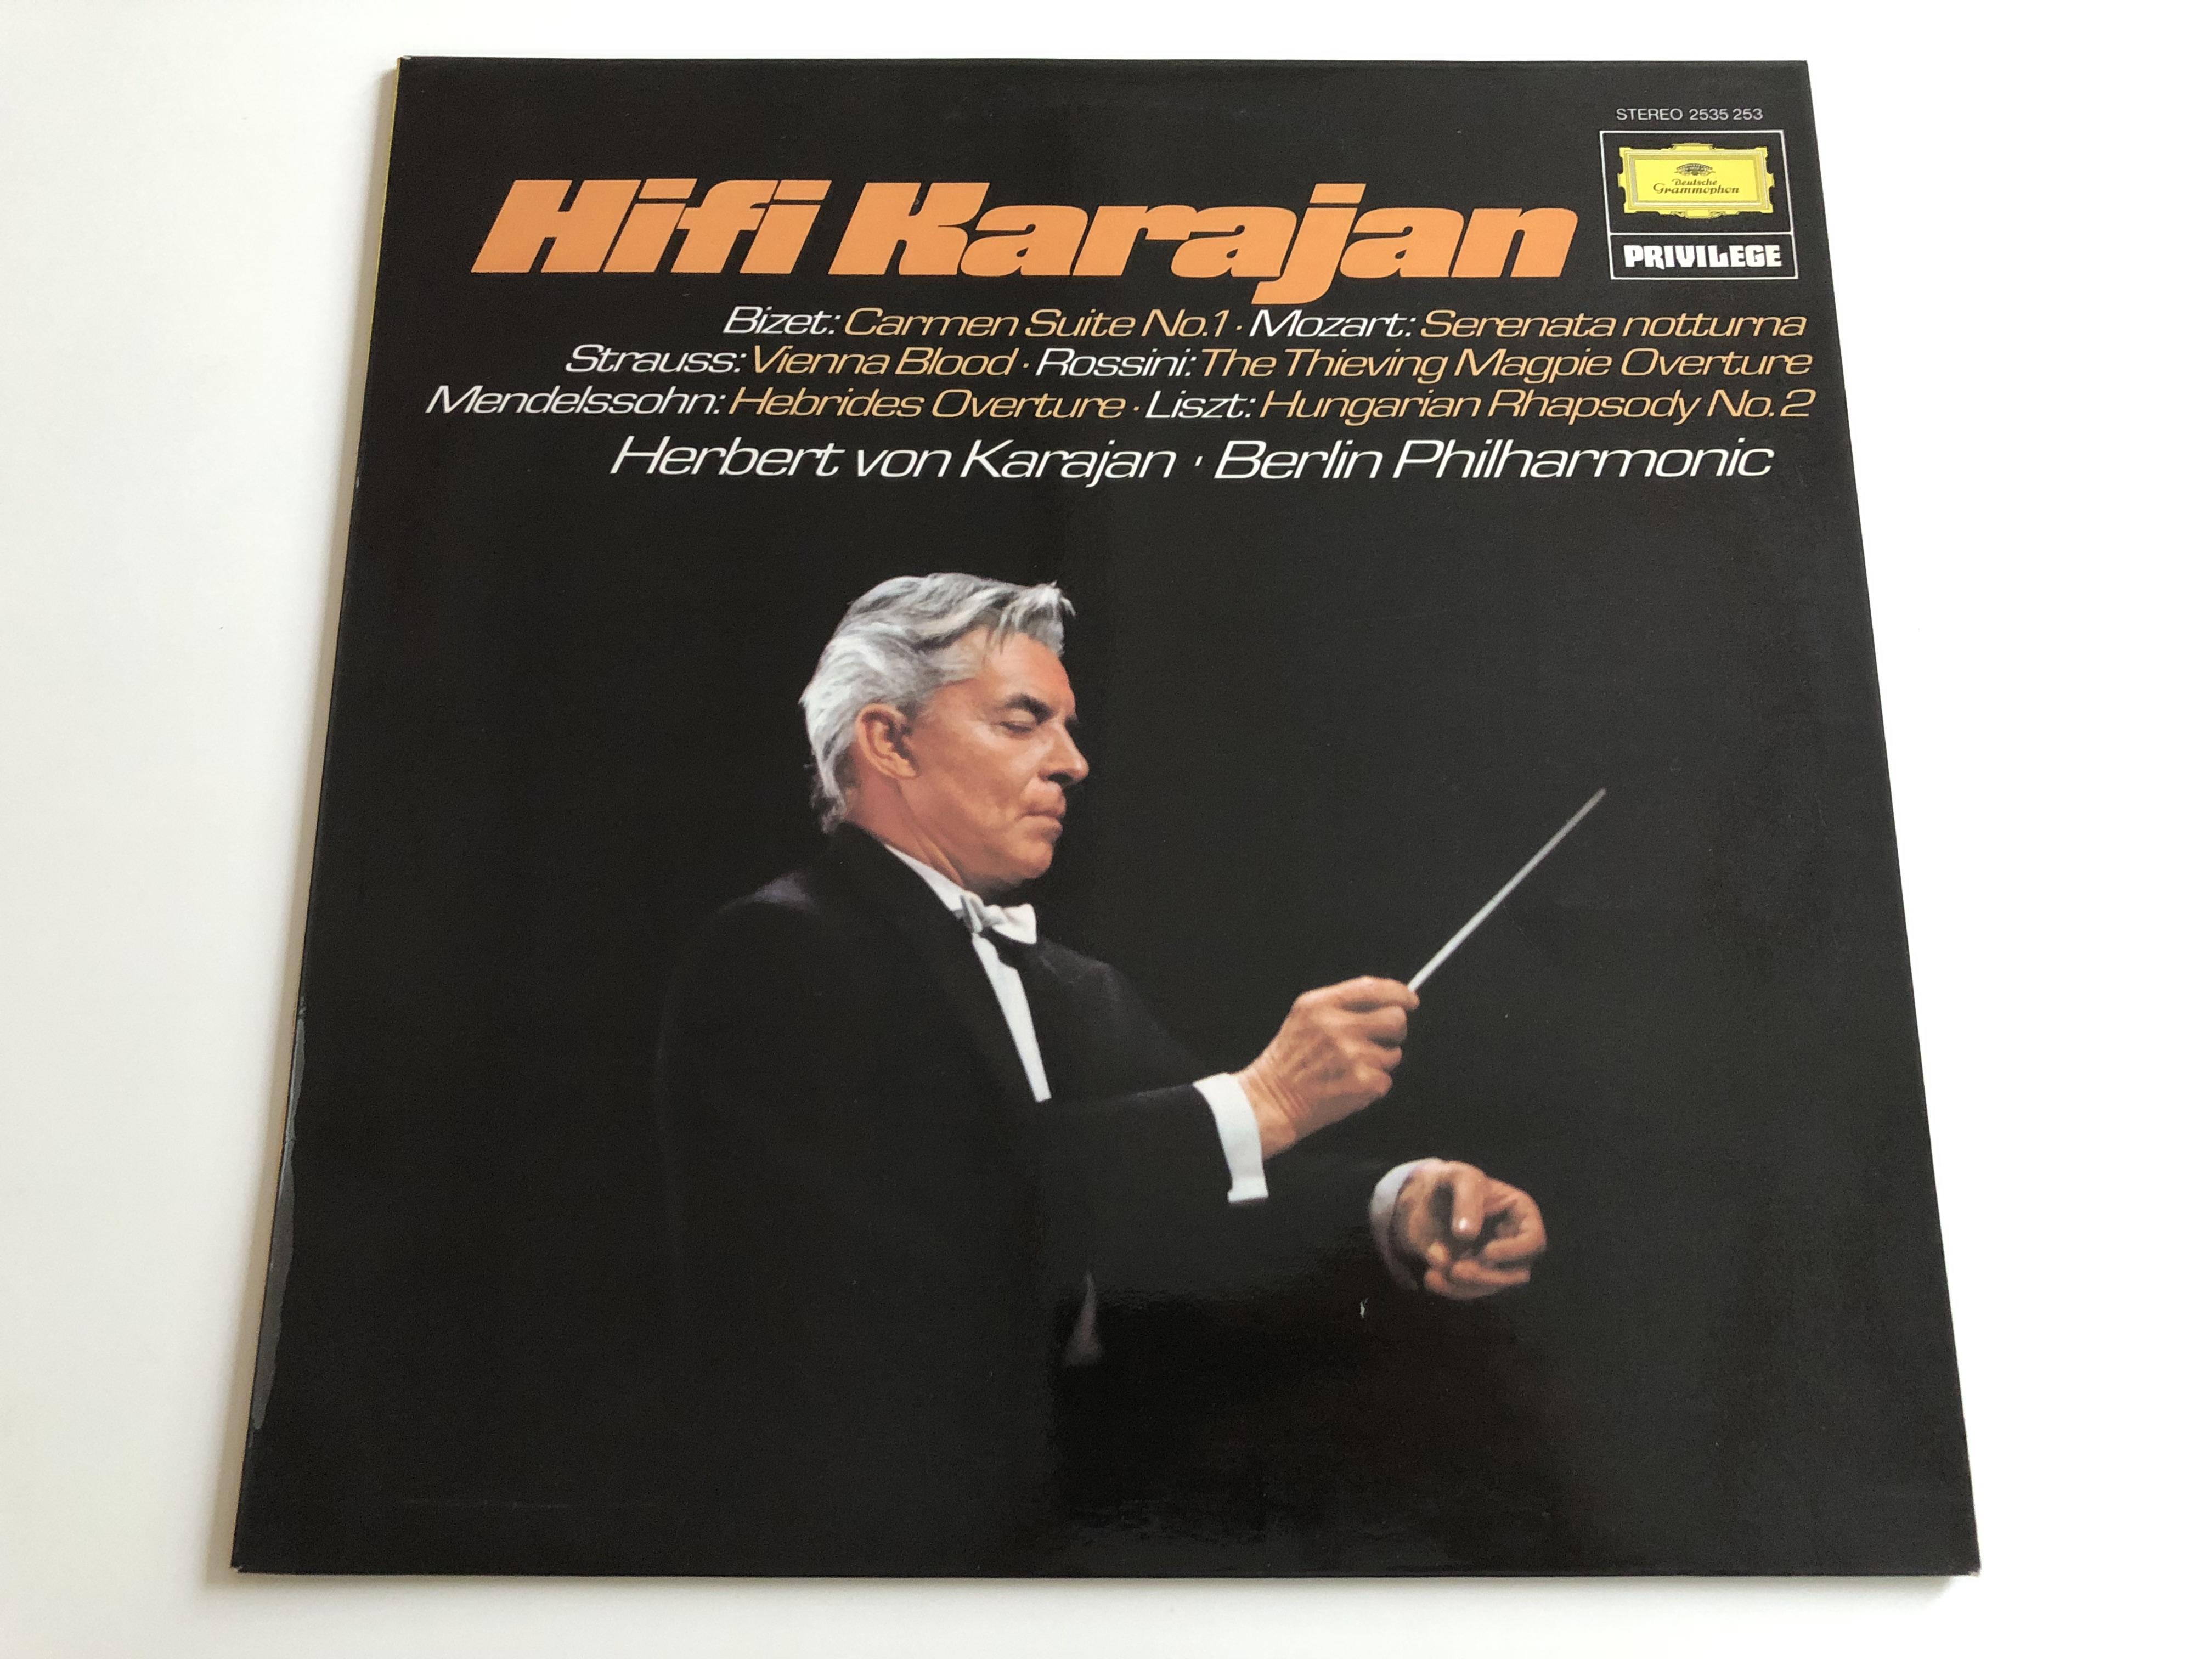 hifi-karajan-berlin-philharmonic-conducted-herbert-von-karajan-bizet-mozart-strauss-rossini-mendelssohn-liszt-deutsche-grammophon-lp-stereo-2535-253-1-.jpg